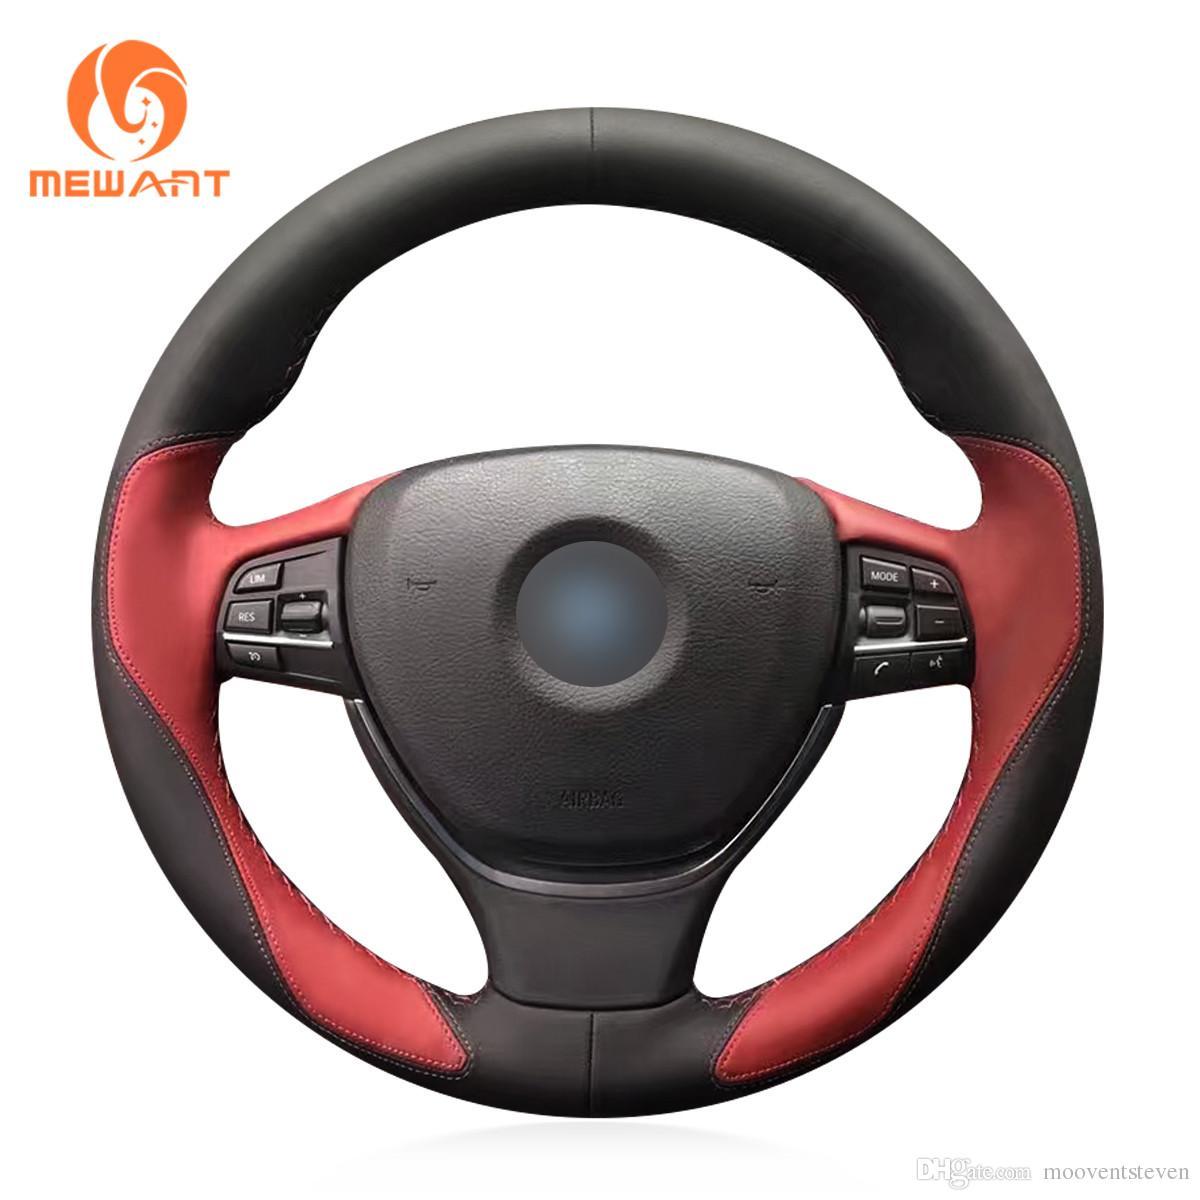 MEWANT Black Wine Red Leather Hand Sew Car Steering Wheel Cover for BMW F10 2014 520i 528i 2013 2014 730Li 740Li 750Li